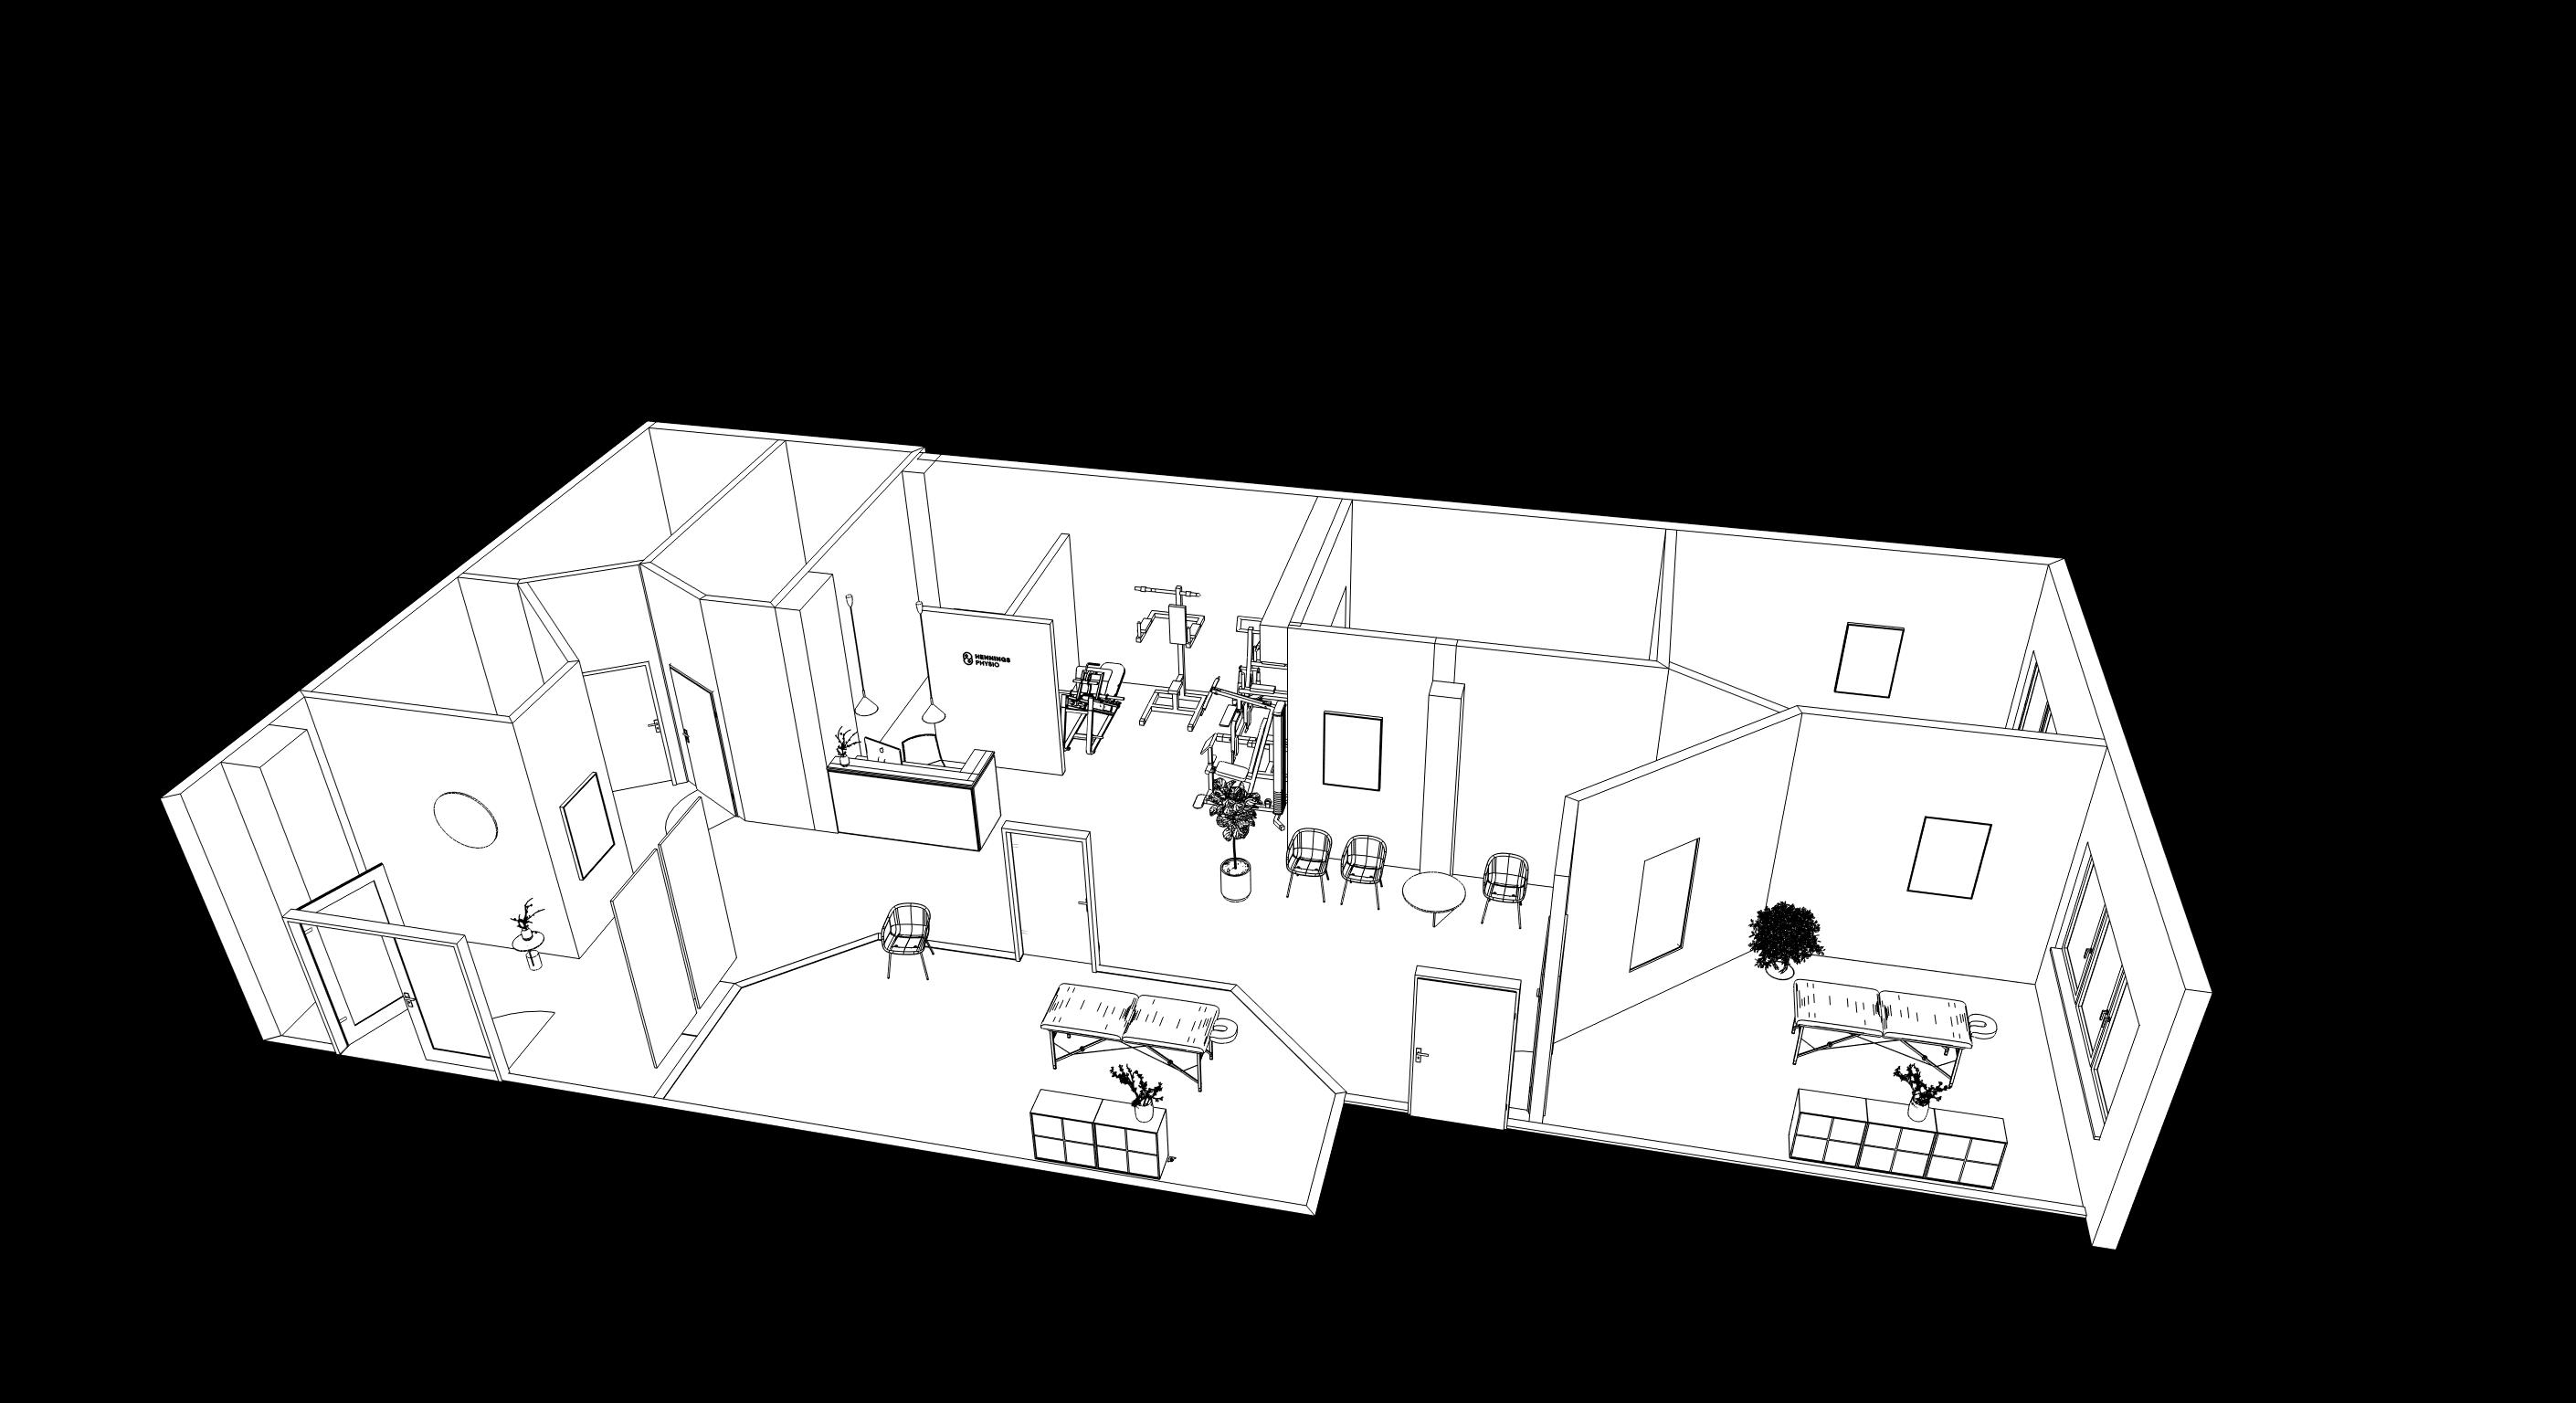 Hennings-Physio-Grundriss1-Studio-Fondo